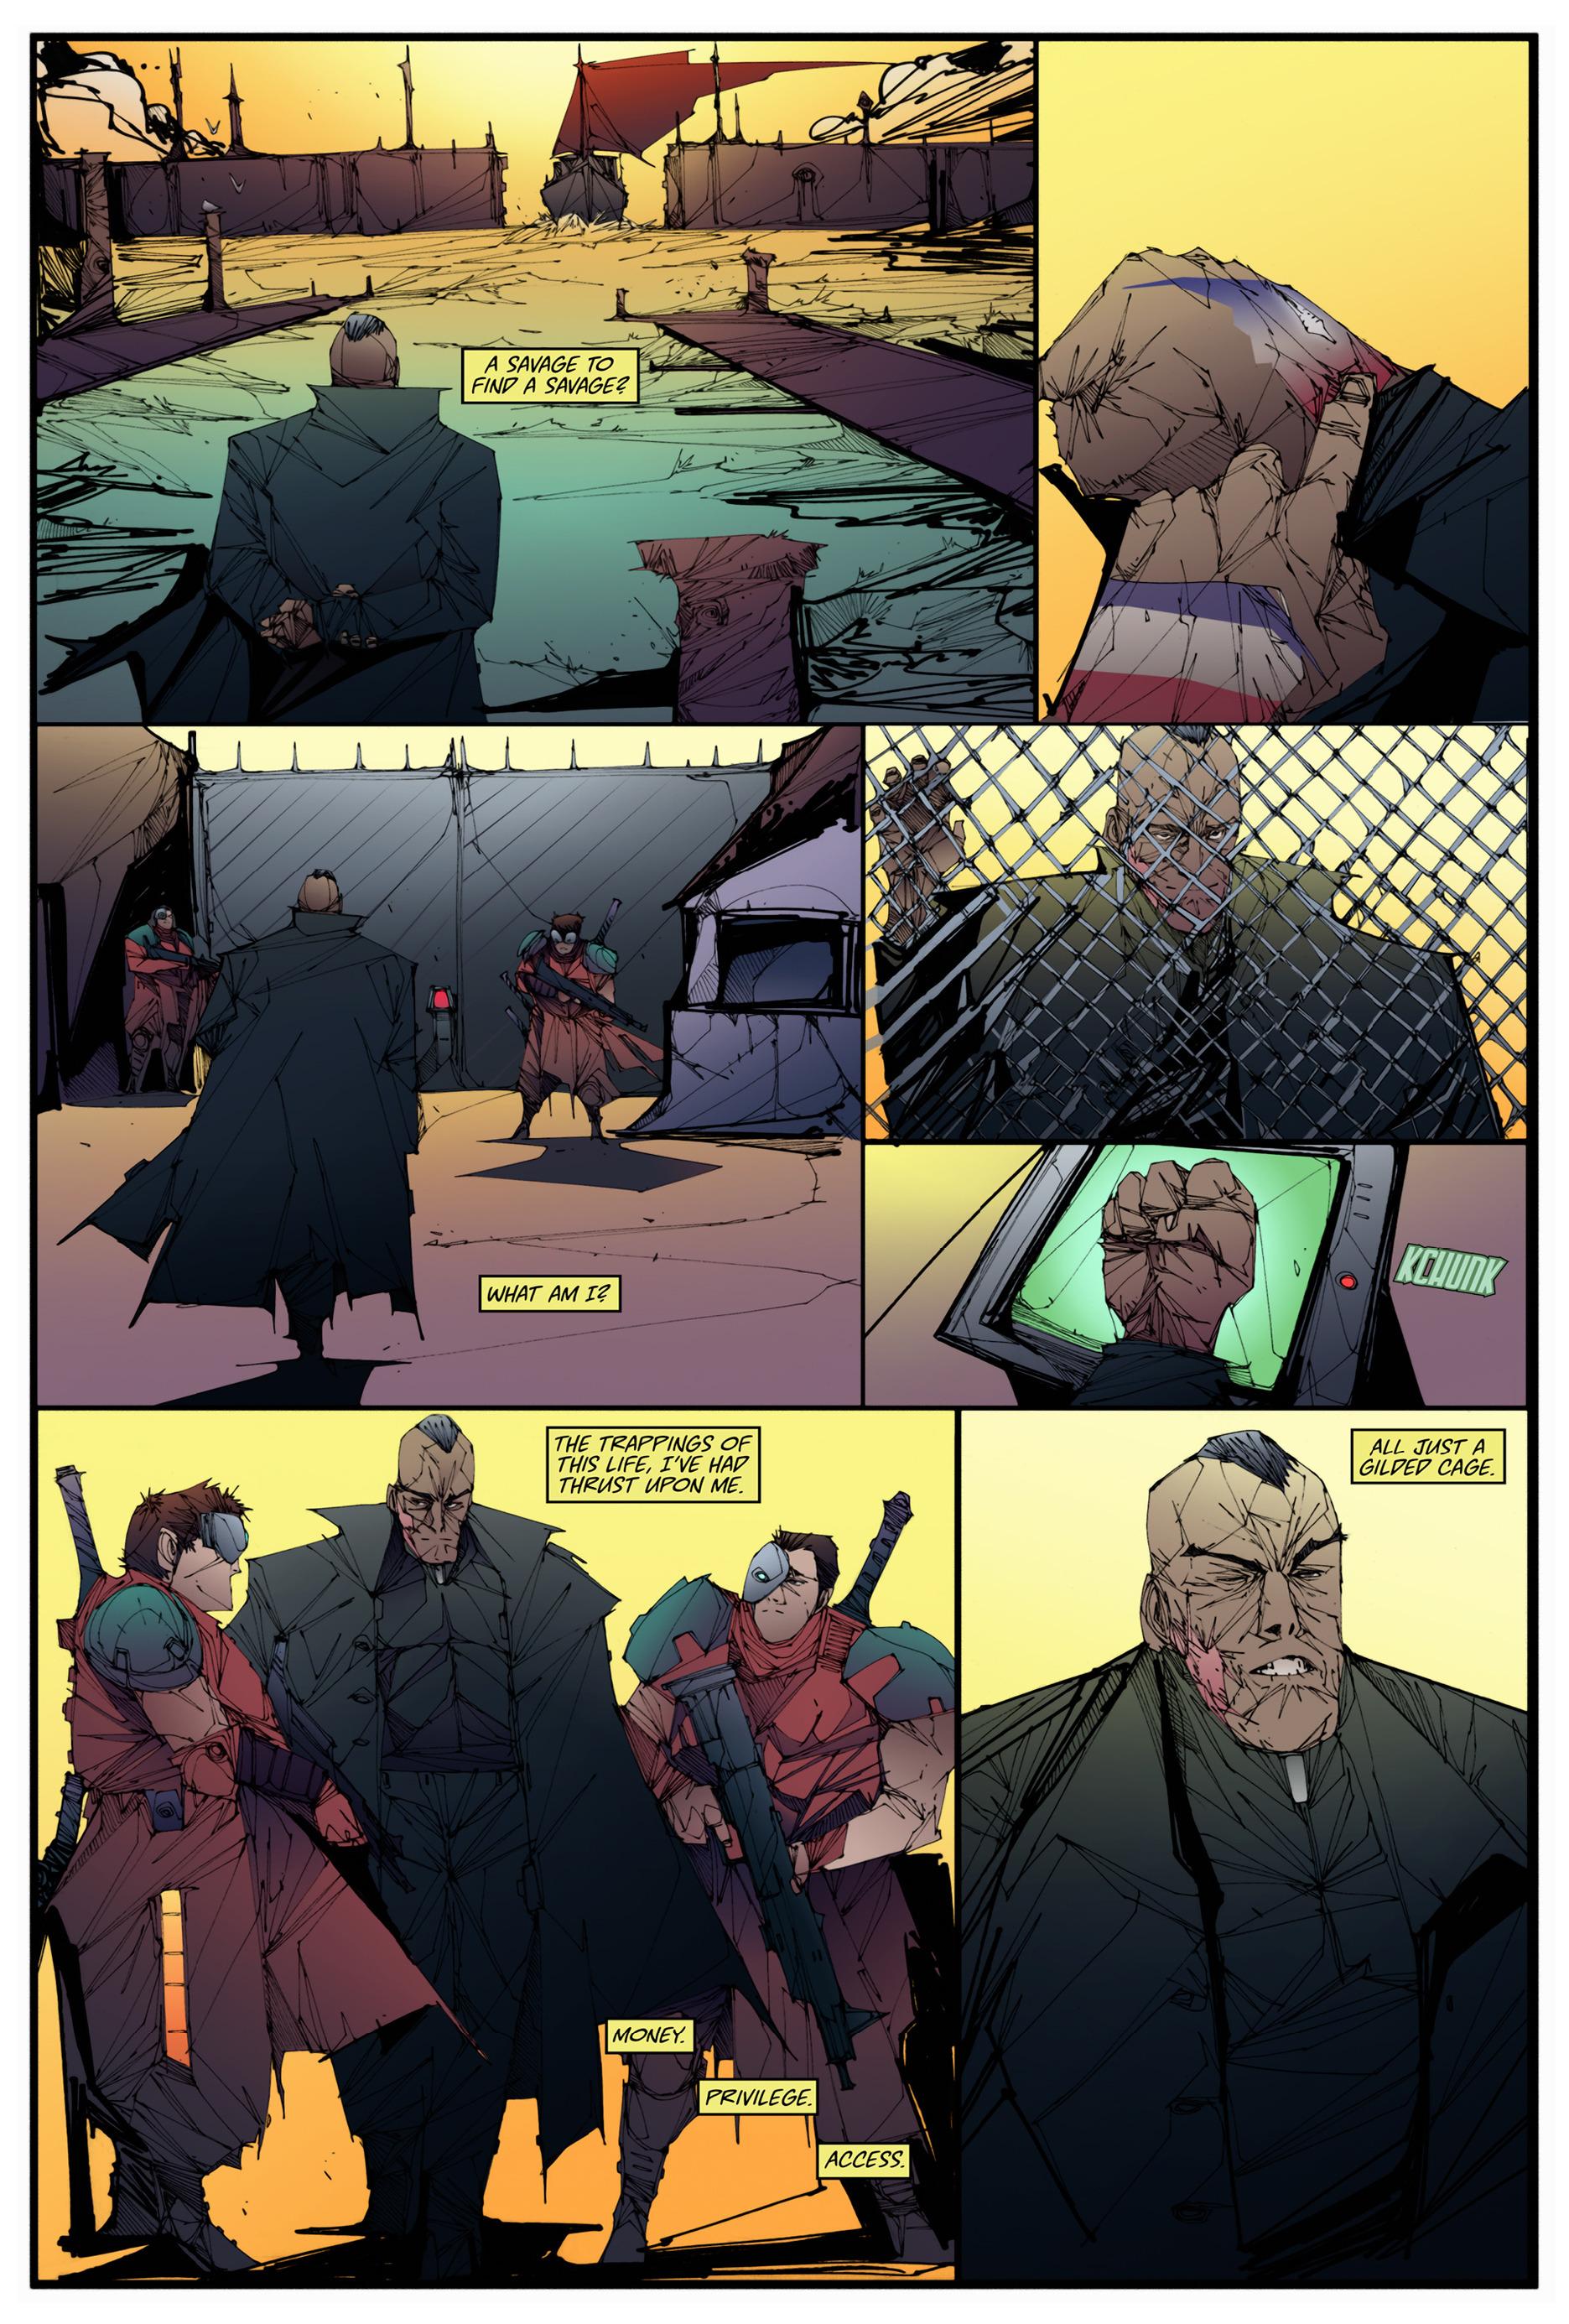 Read online Scrimshaw comic -  Issue #2 - 5